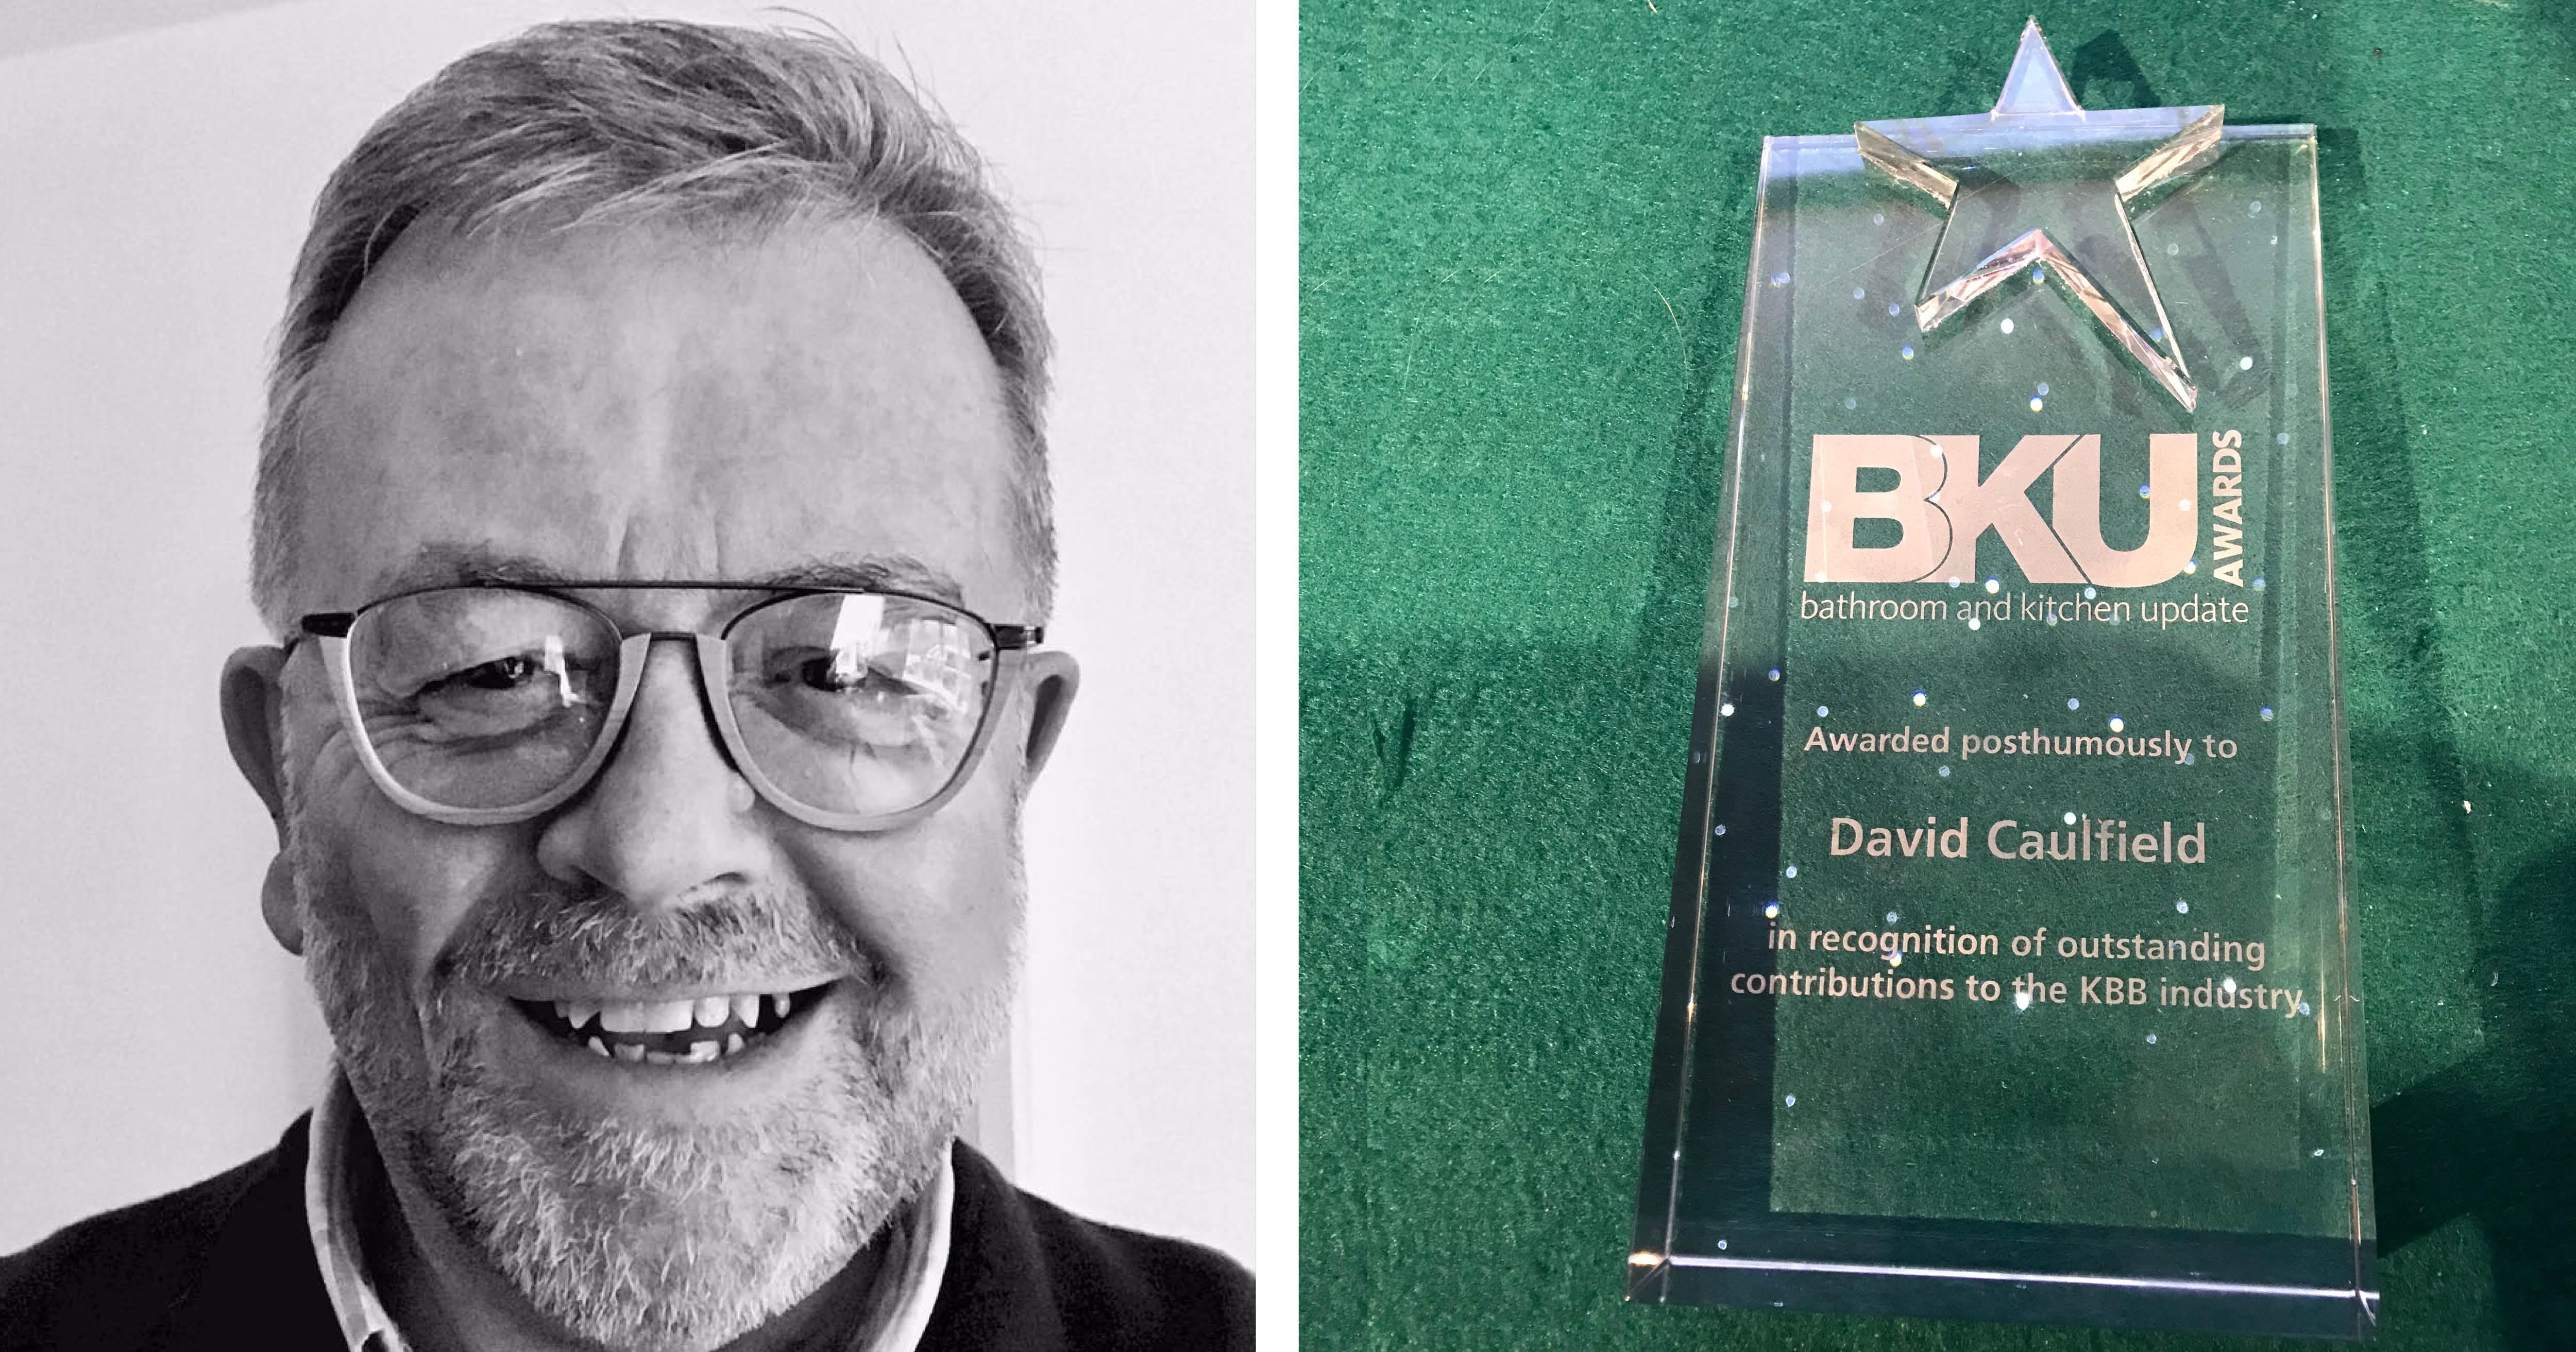 BKU Awards Honour David Caulfield